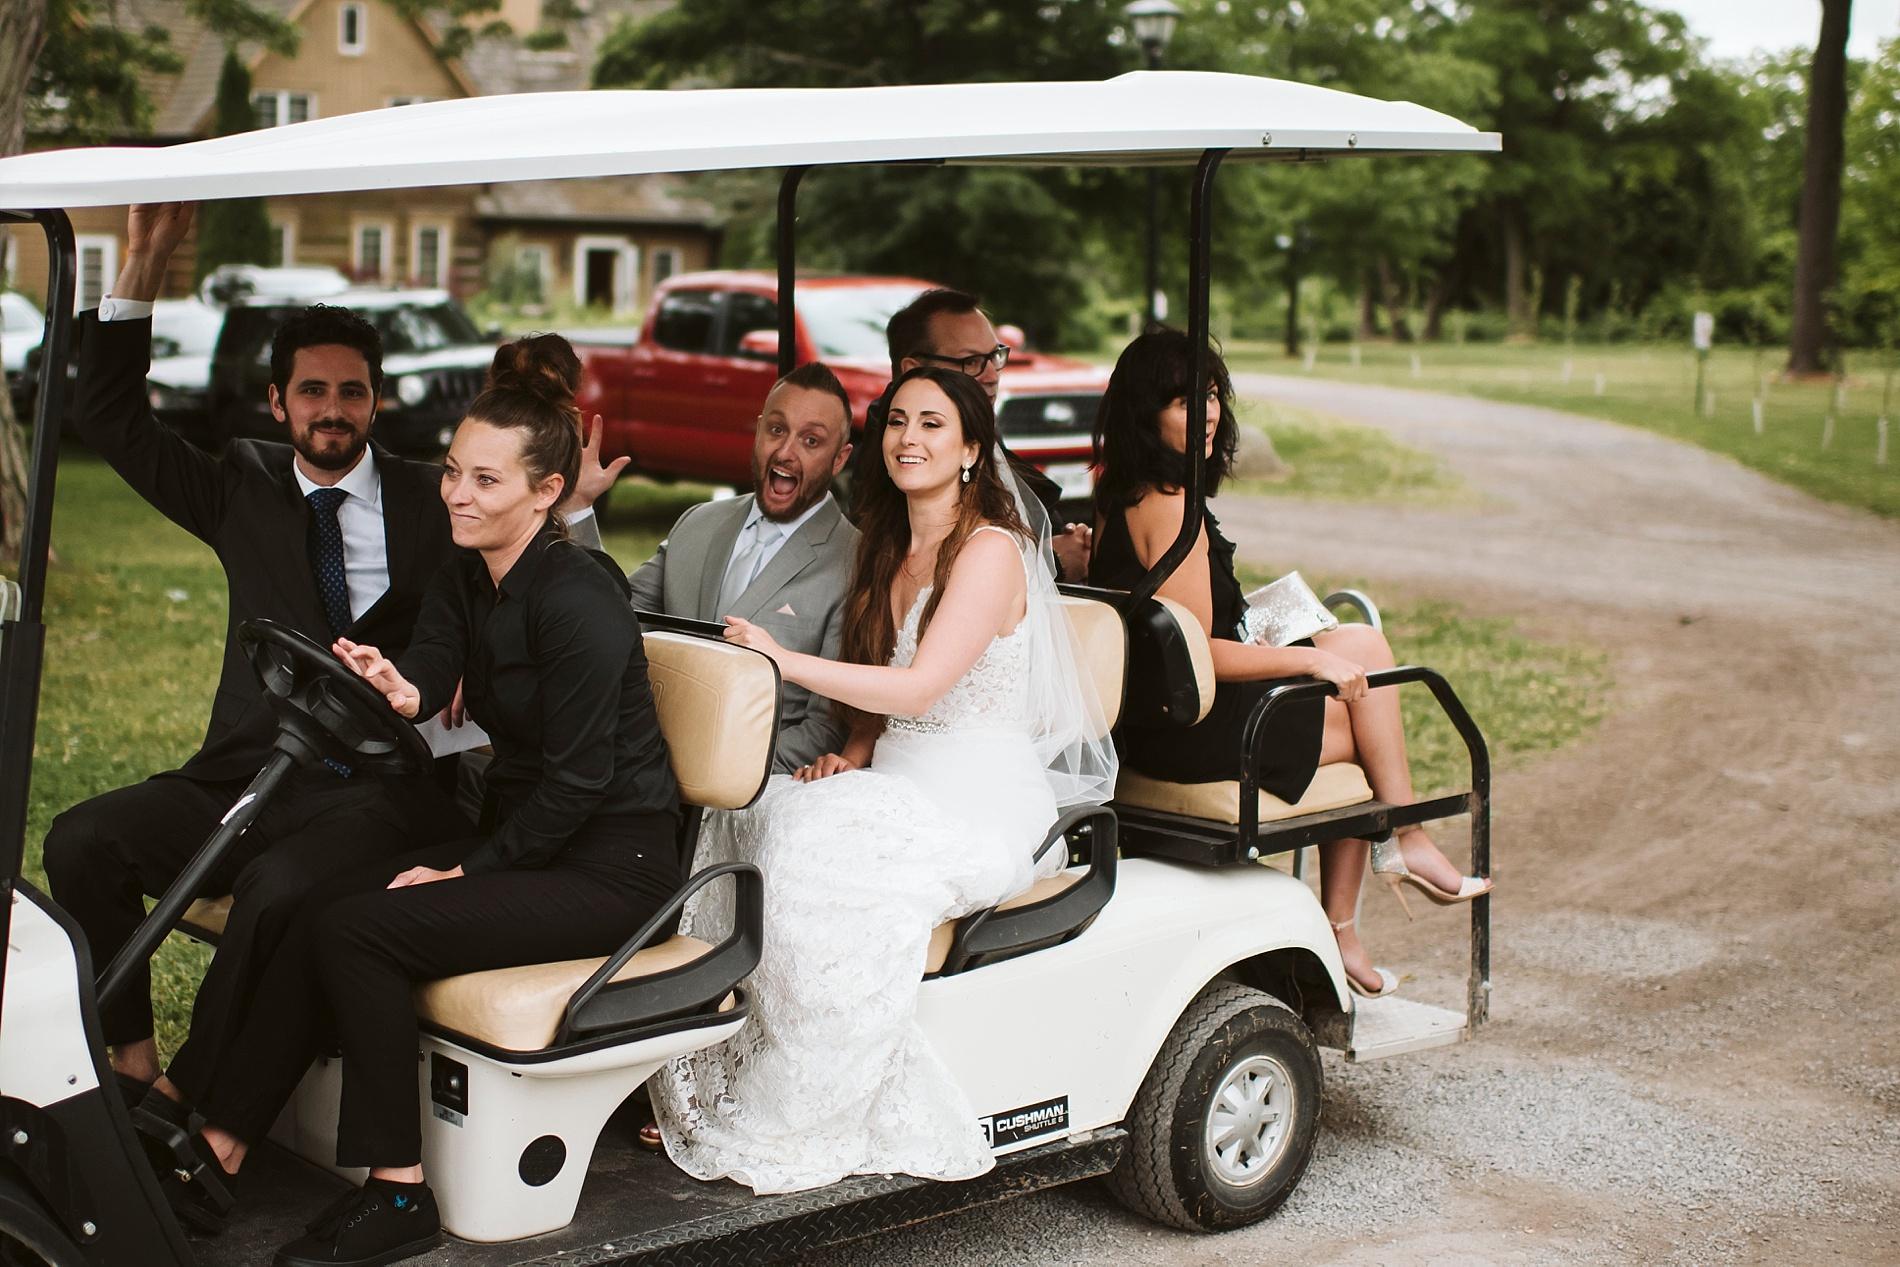 Kawartha_Lakes_Wedding_Bobcageon_Eganridge_Resort_Toronto_Photographer_0063.jpg